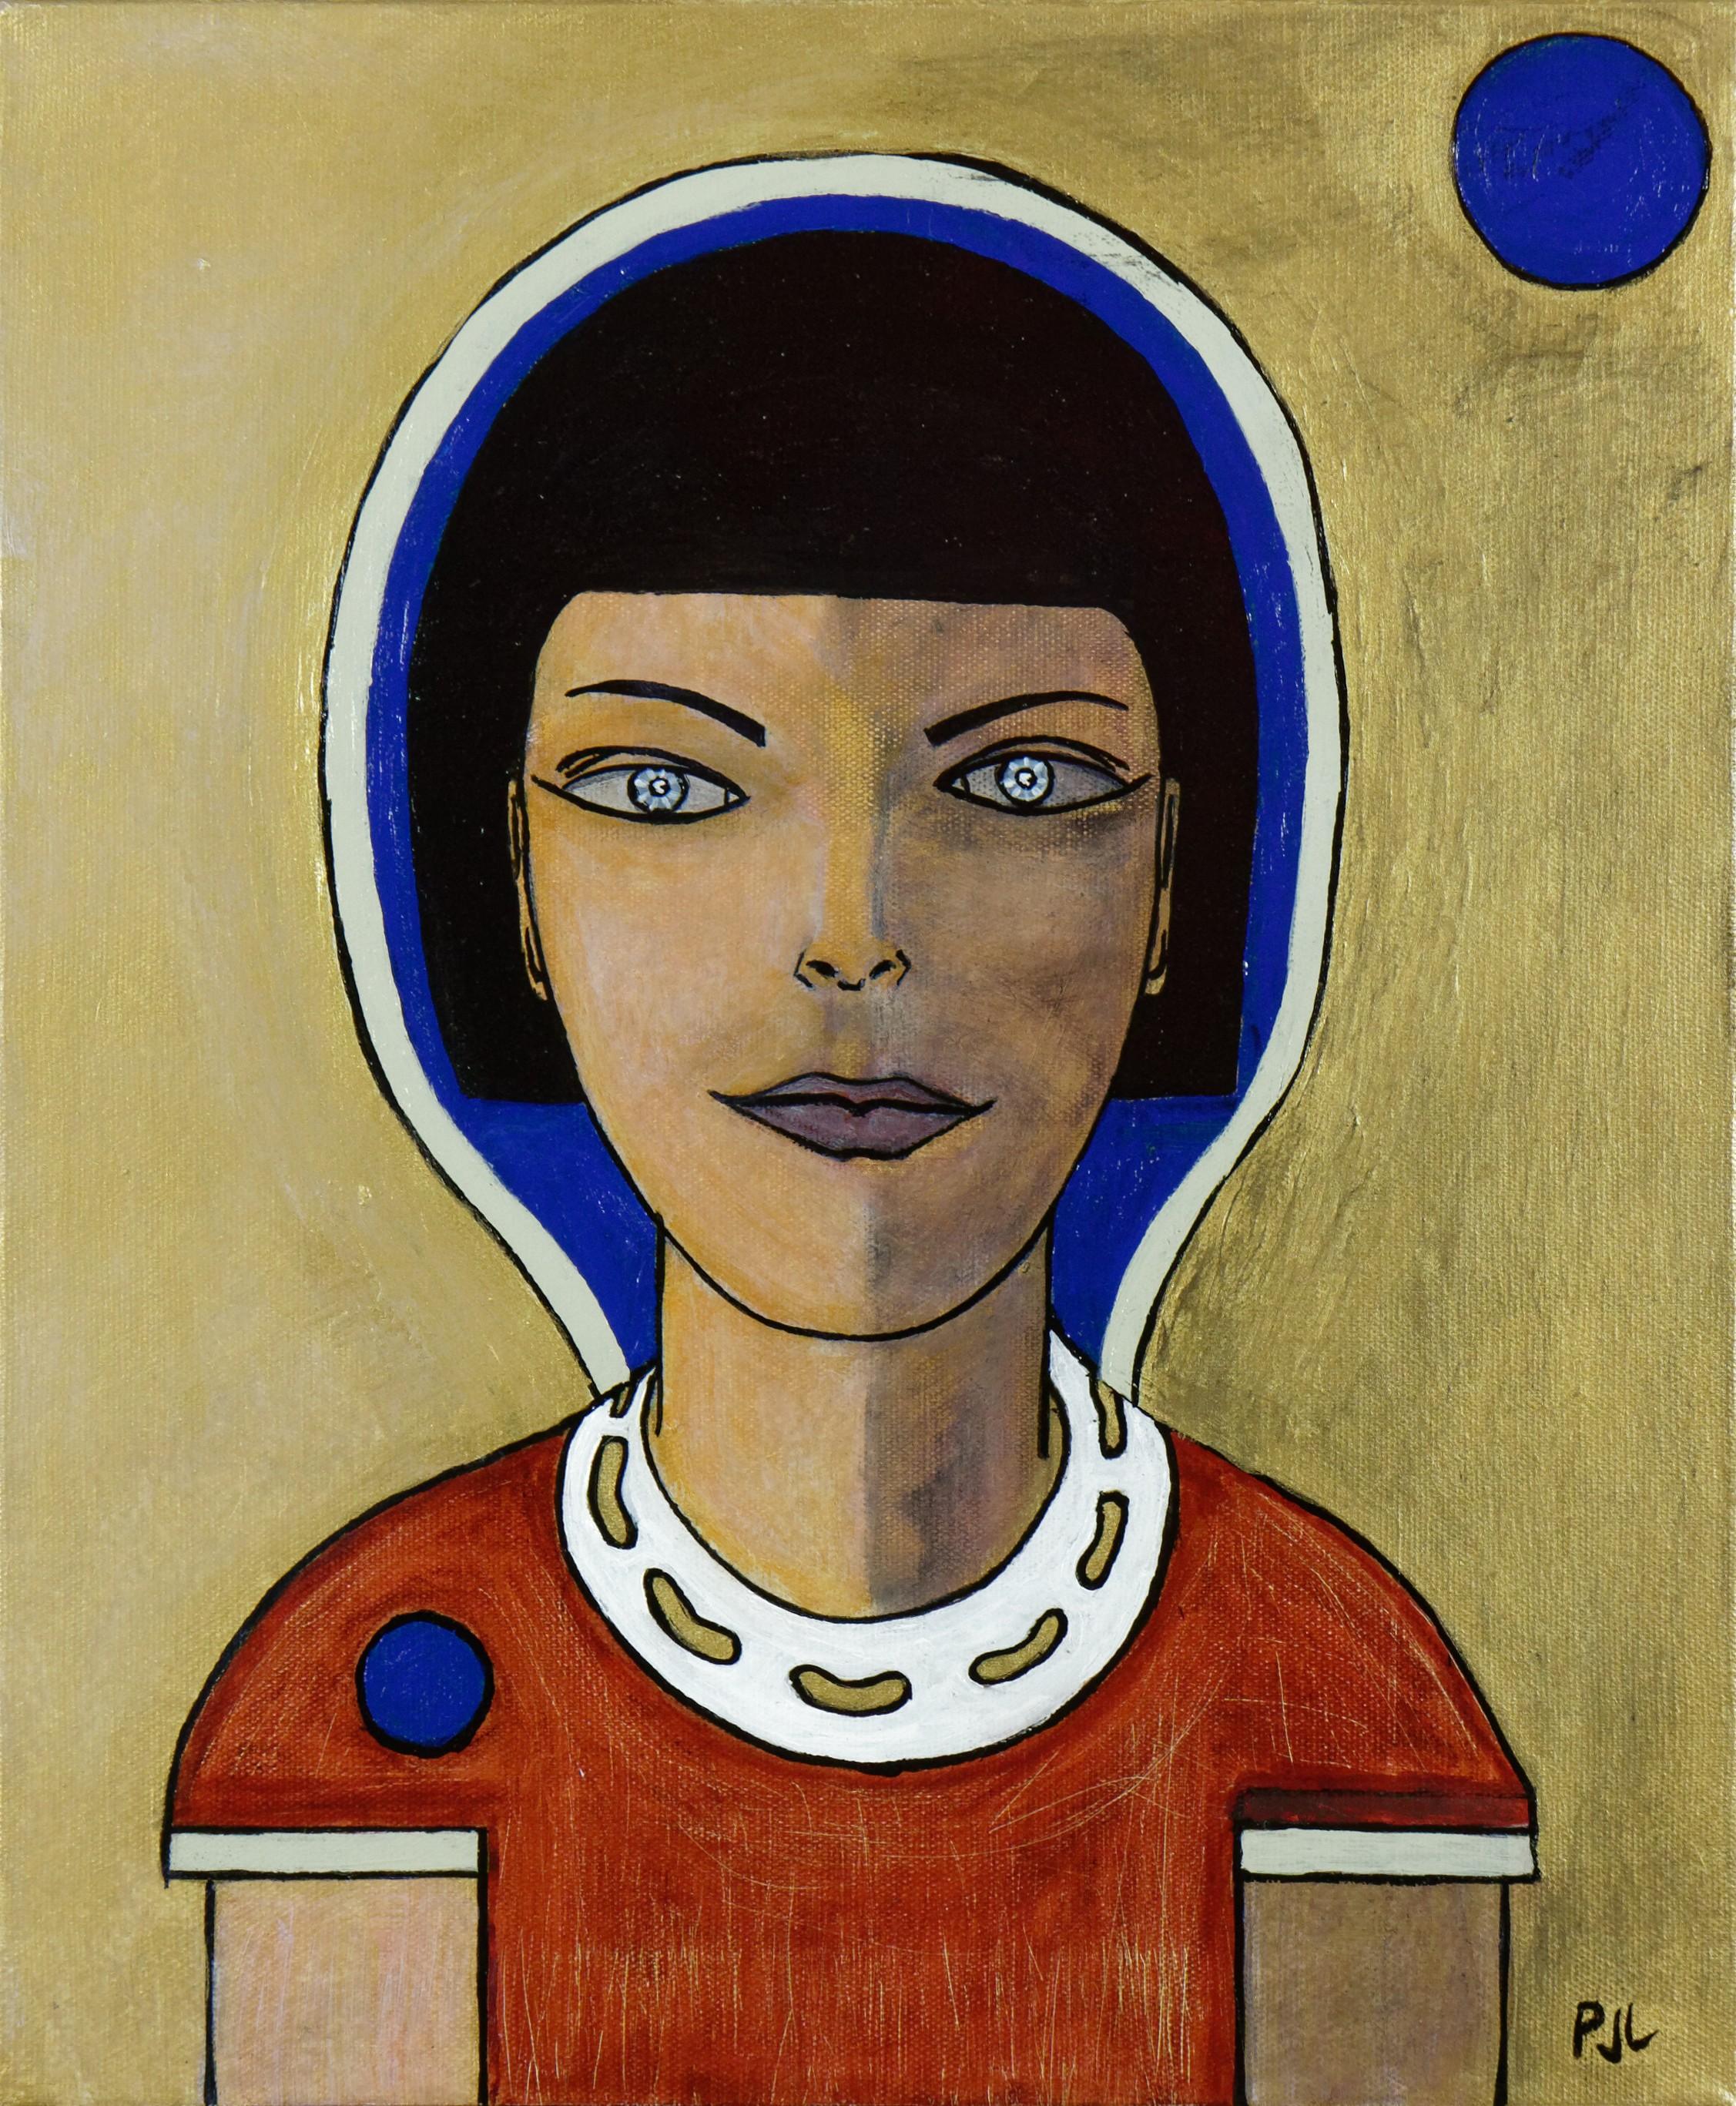 pianezzi-letizia-femme-portrait